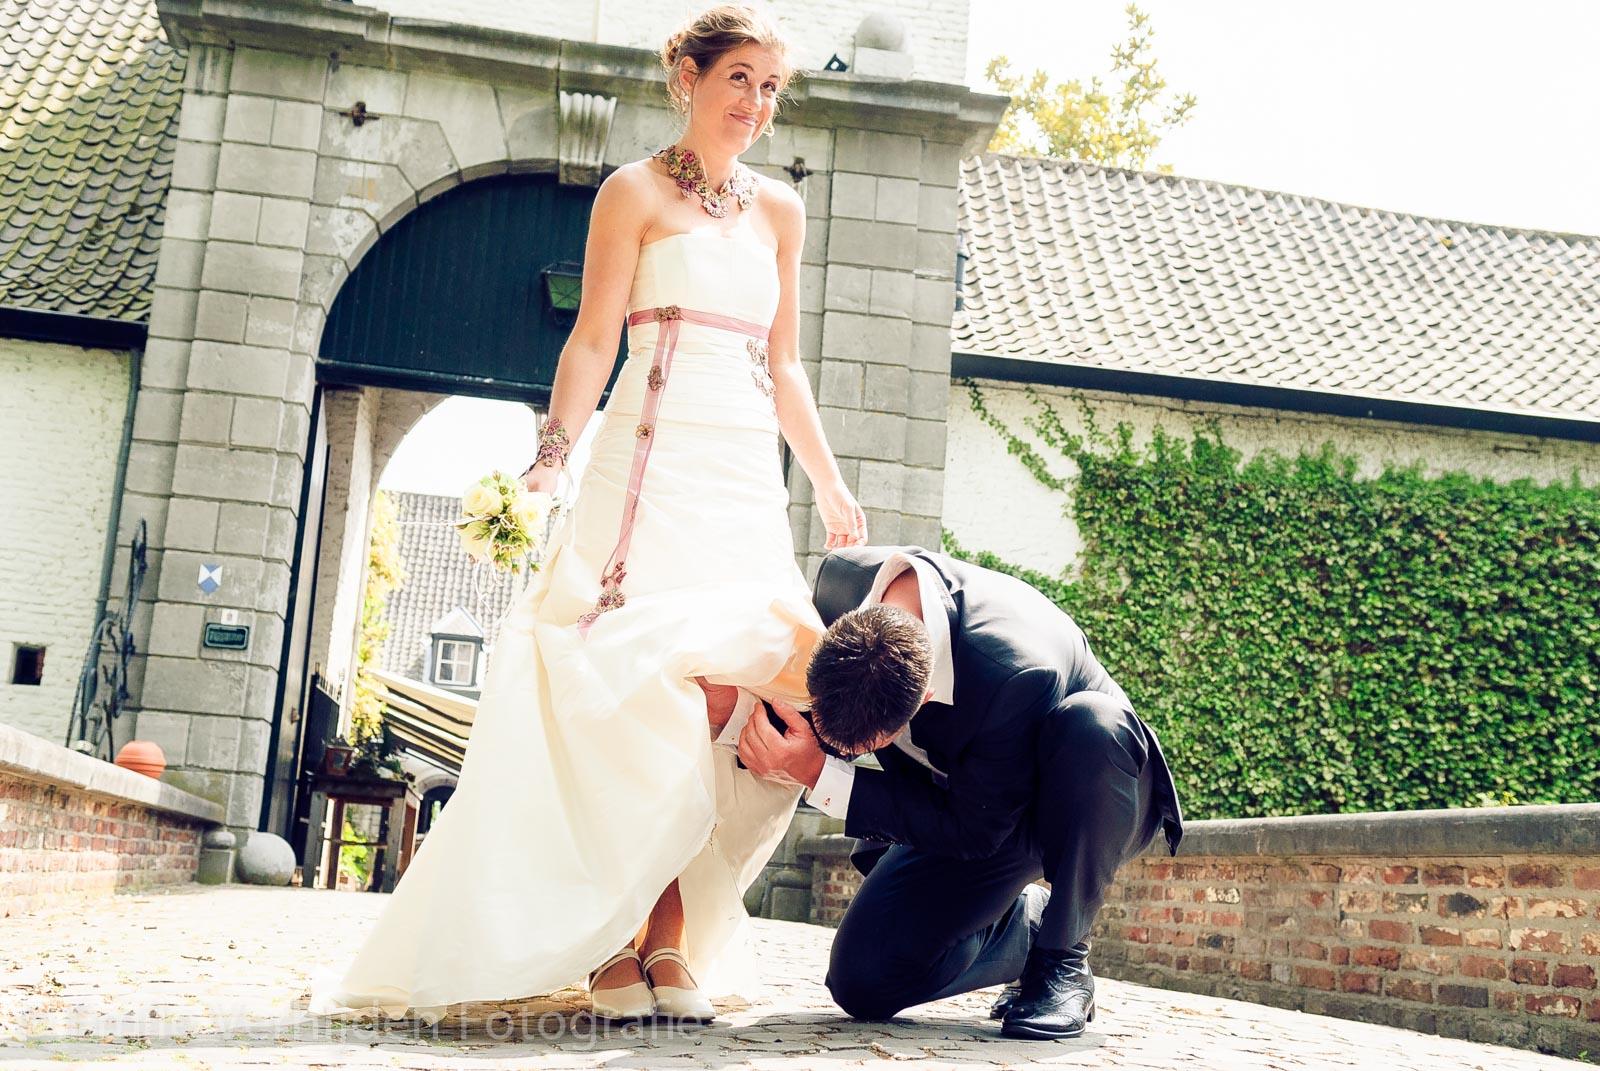 Bruidegom kijkt onder rok van bruid Kasteel Daelenbroeck-Herkenbosch